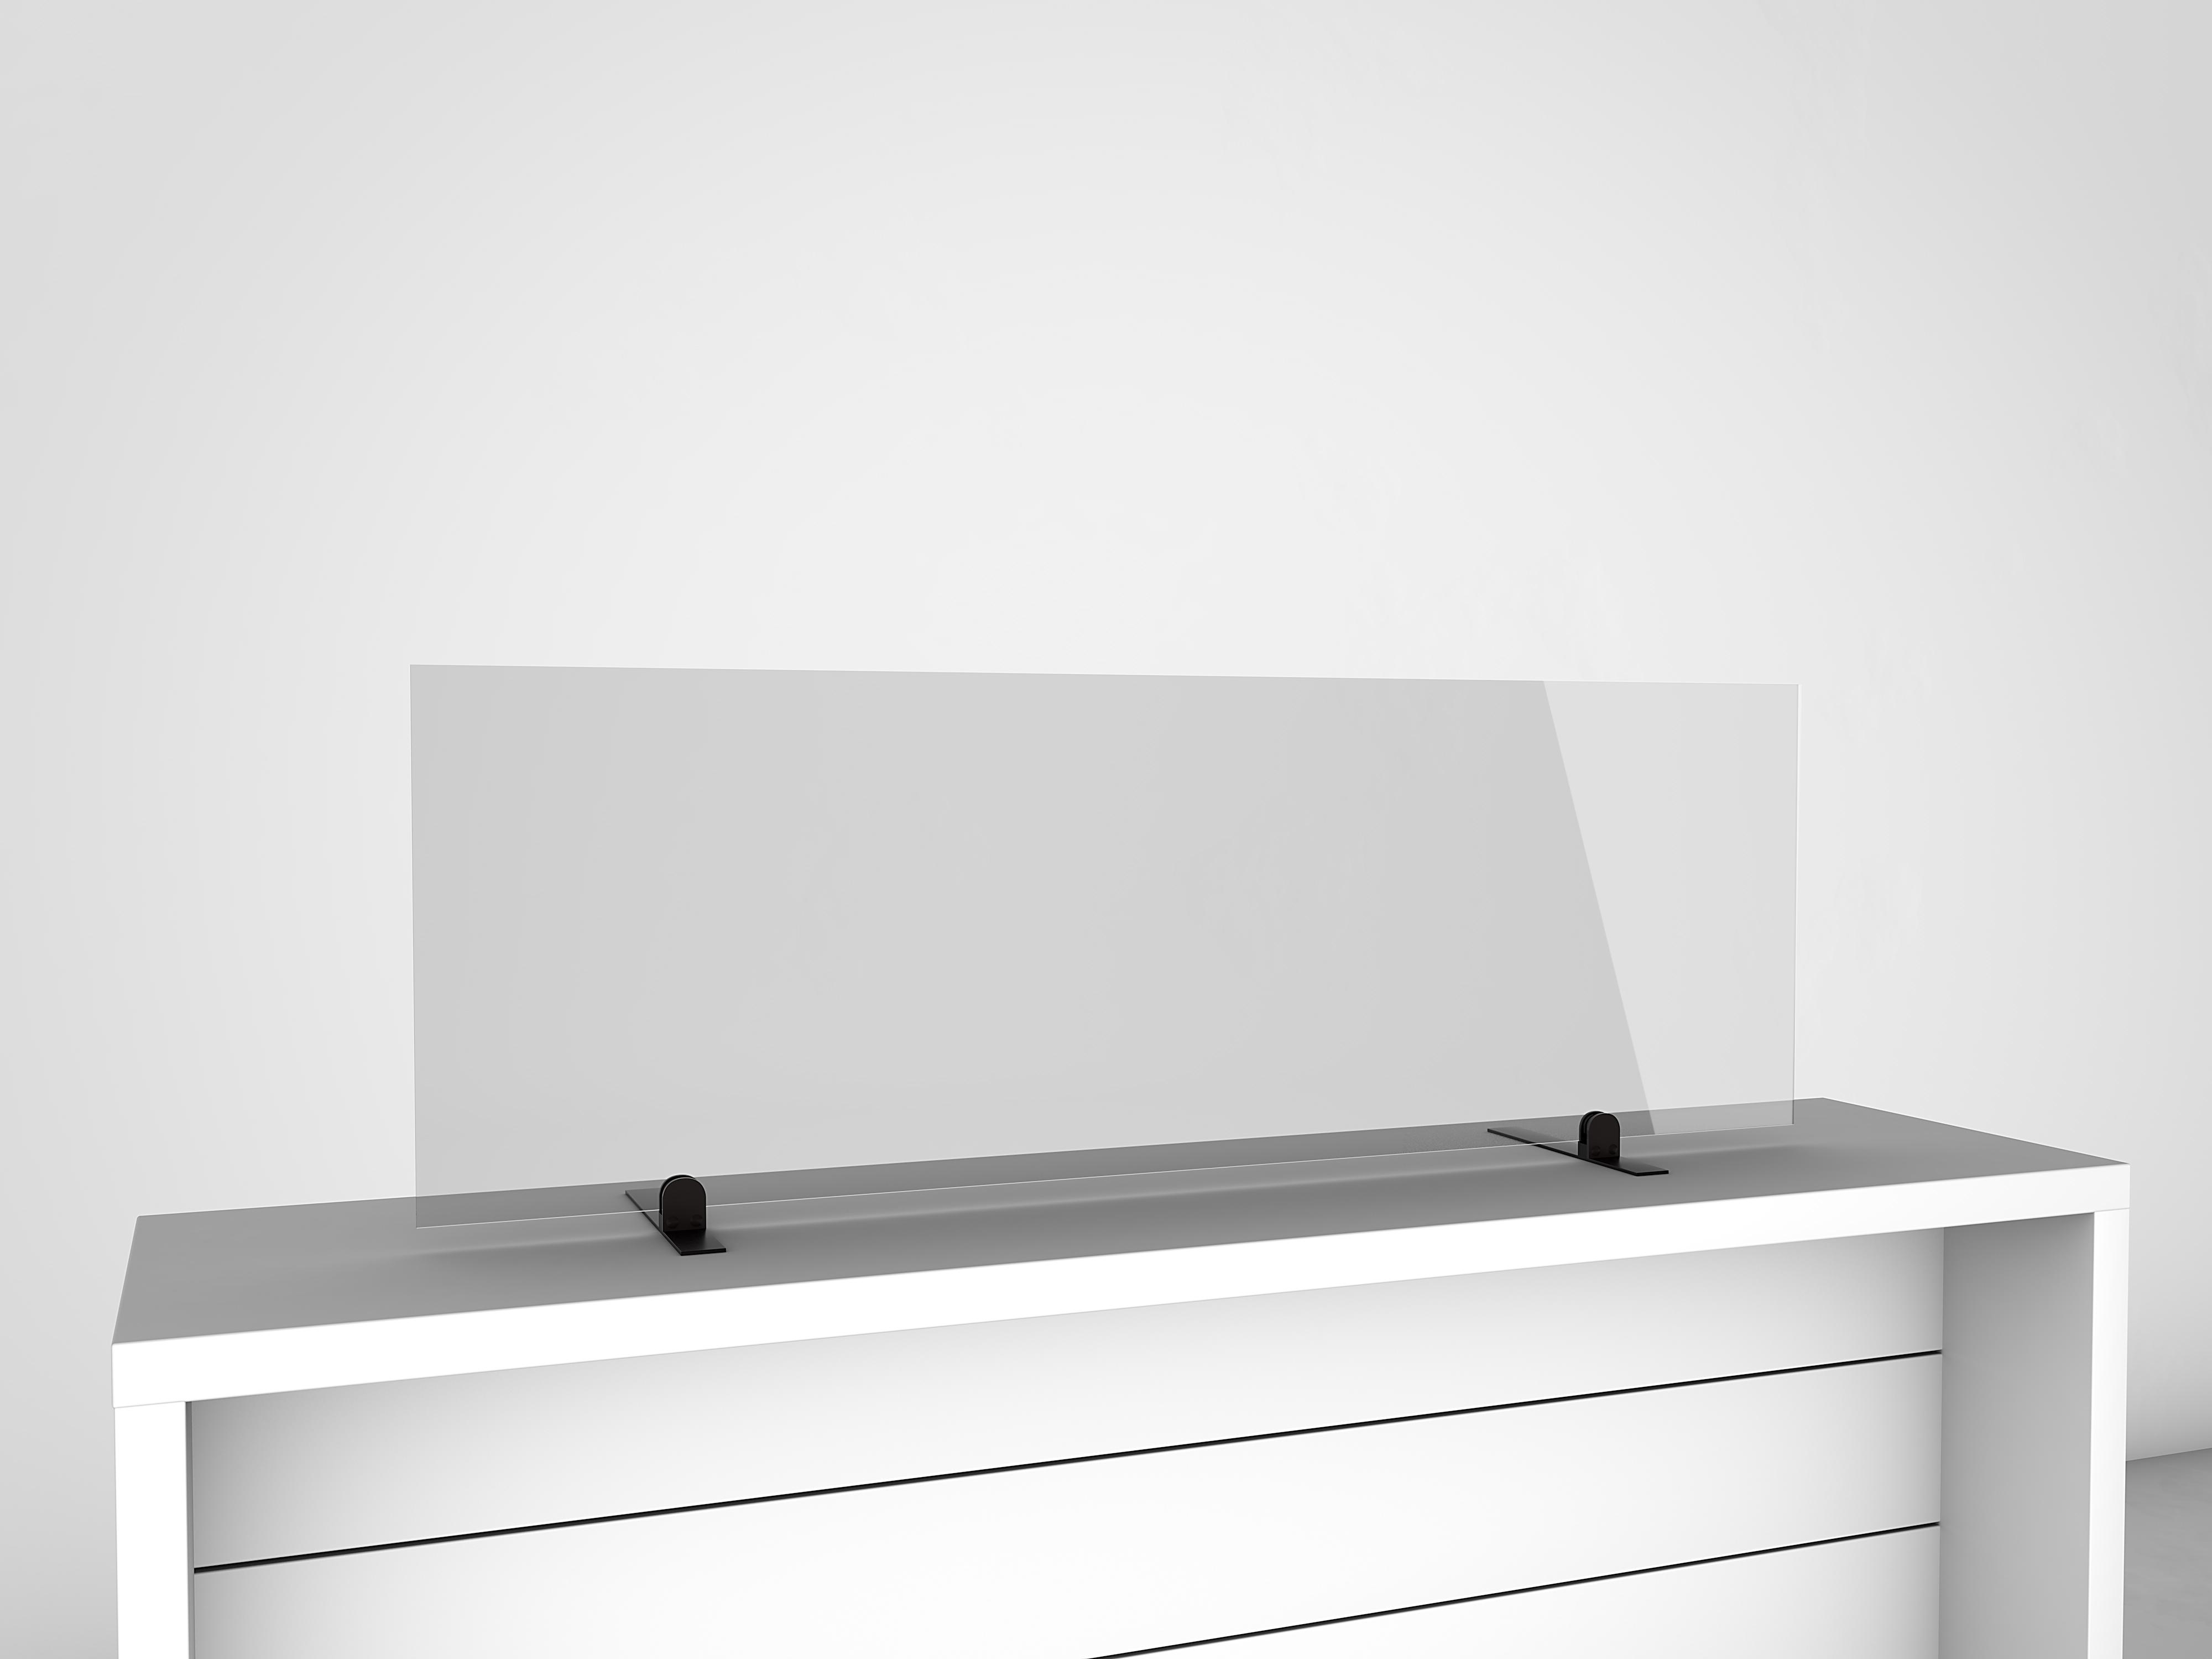 Gutta Spuckschutzwand Premium 1500 x 500 x 4 mm